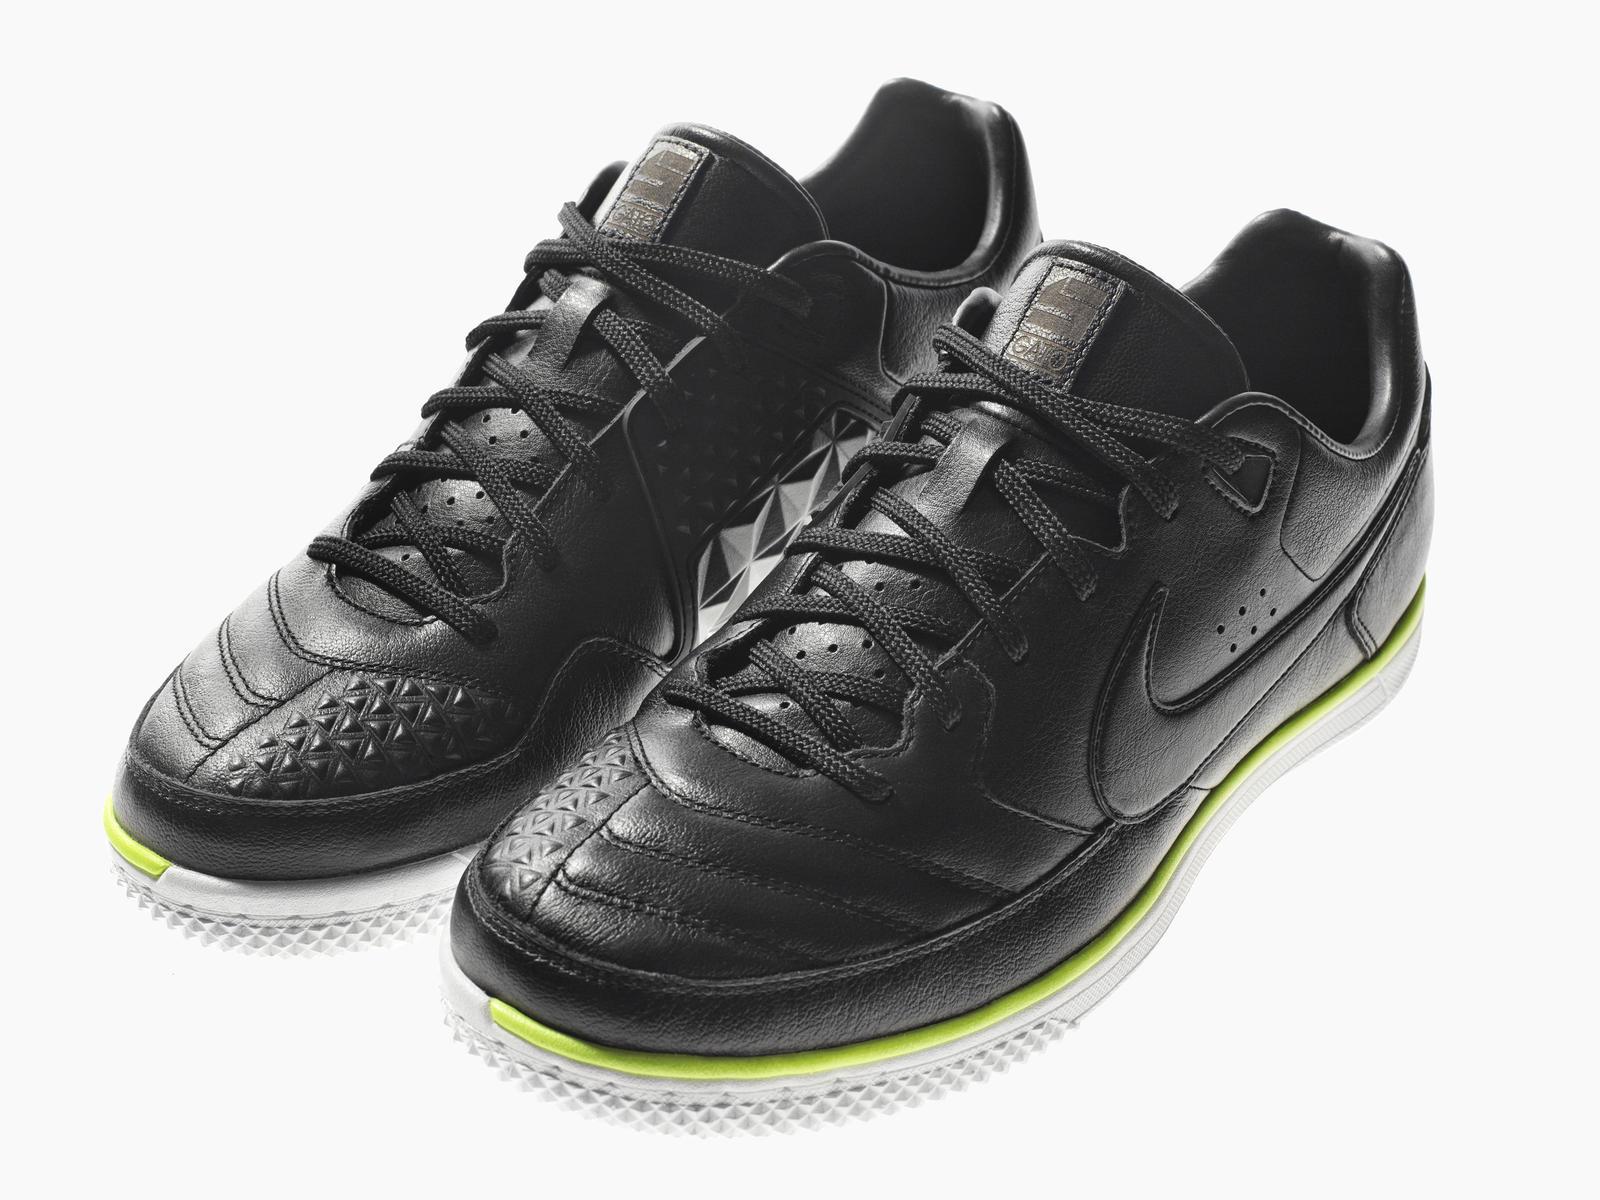 Nike Introduces the Nike5 Gato Street - Nike News